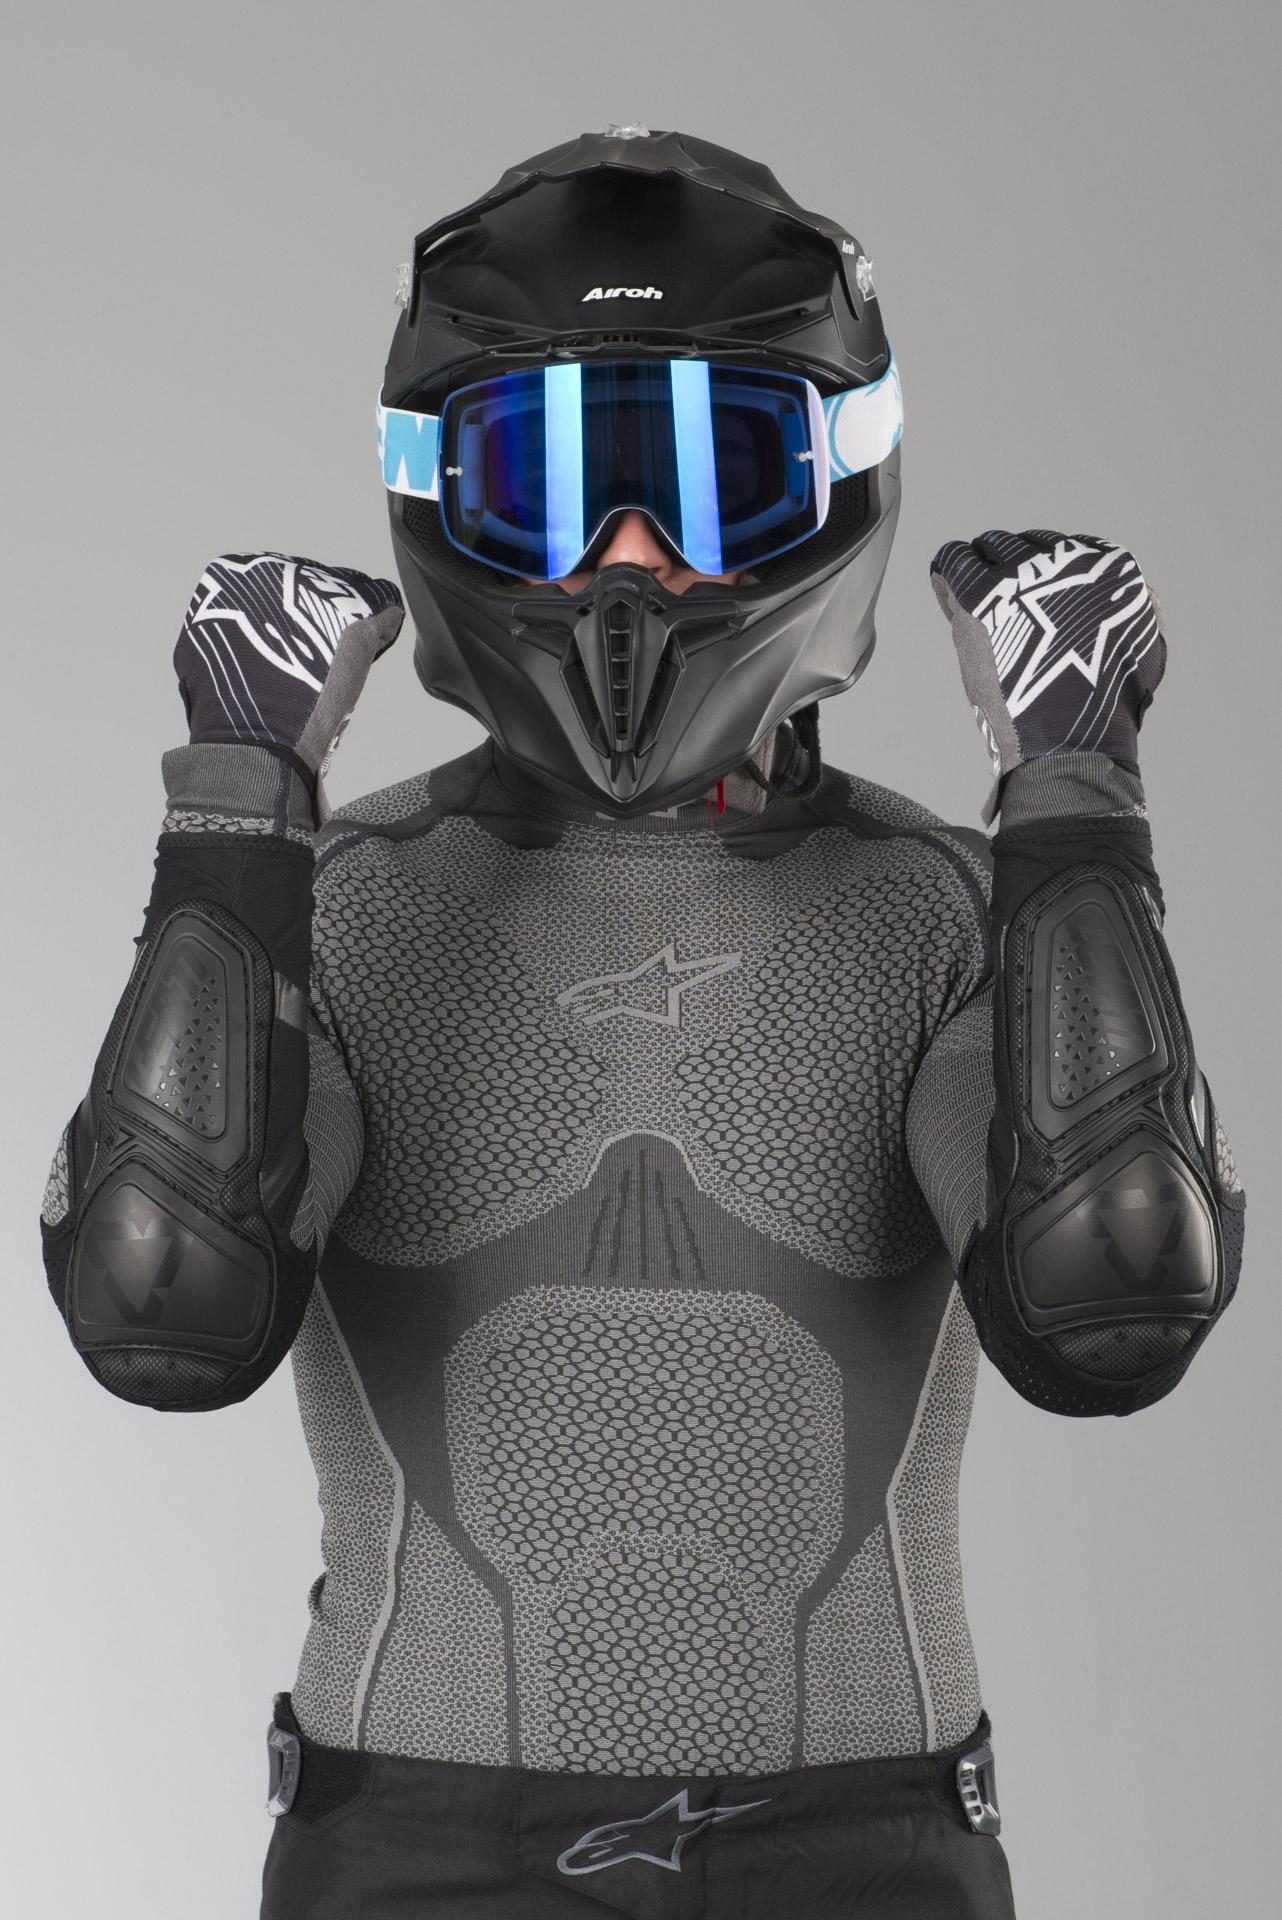 White, XX-Large Leatt Contour Elbow Guard